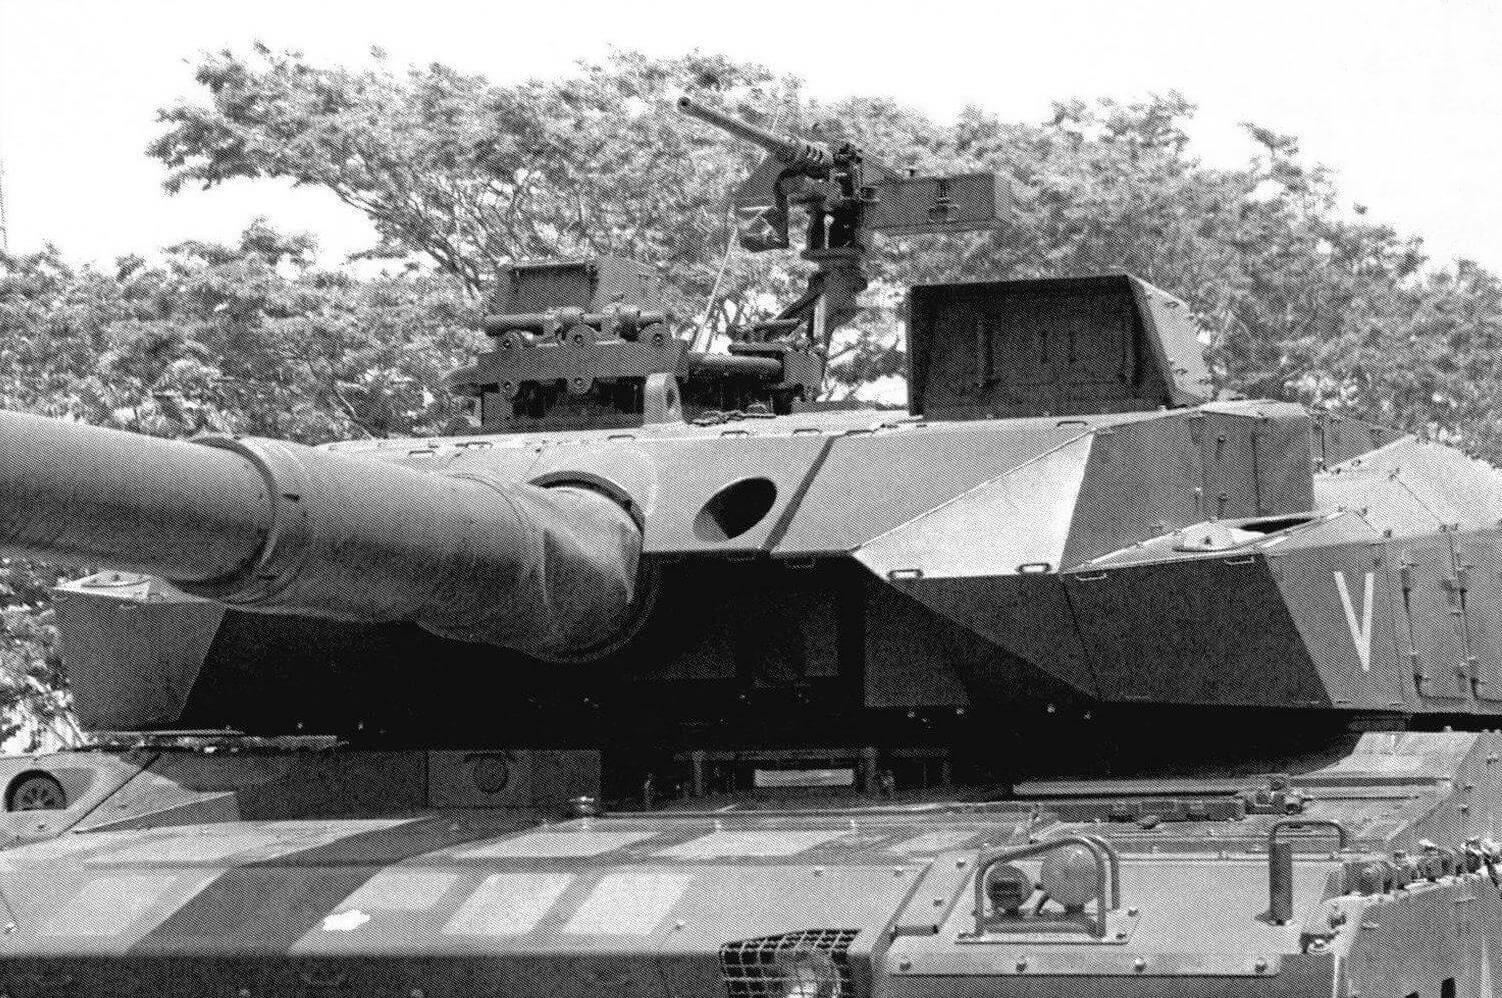 Башня танка «10» крупным планом